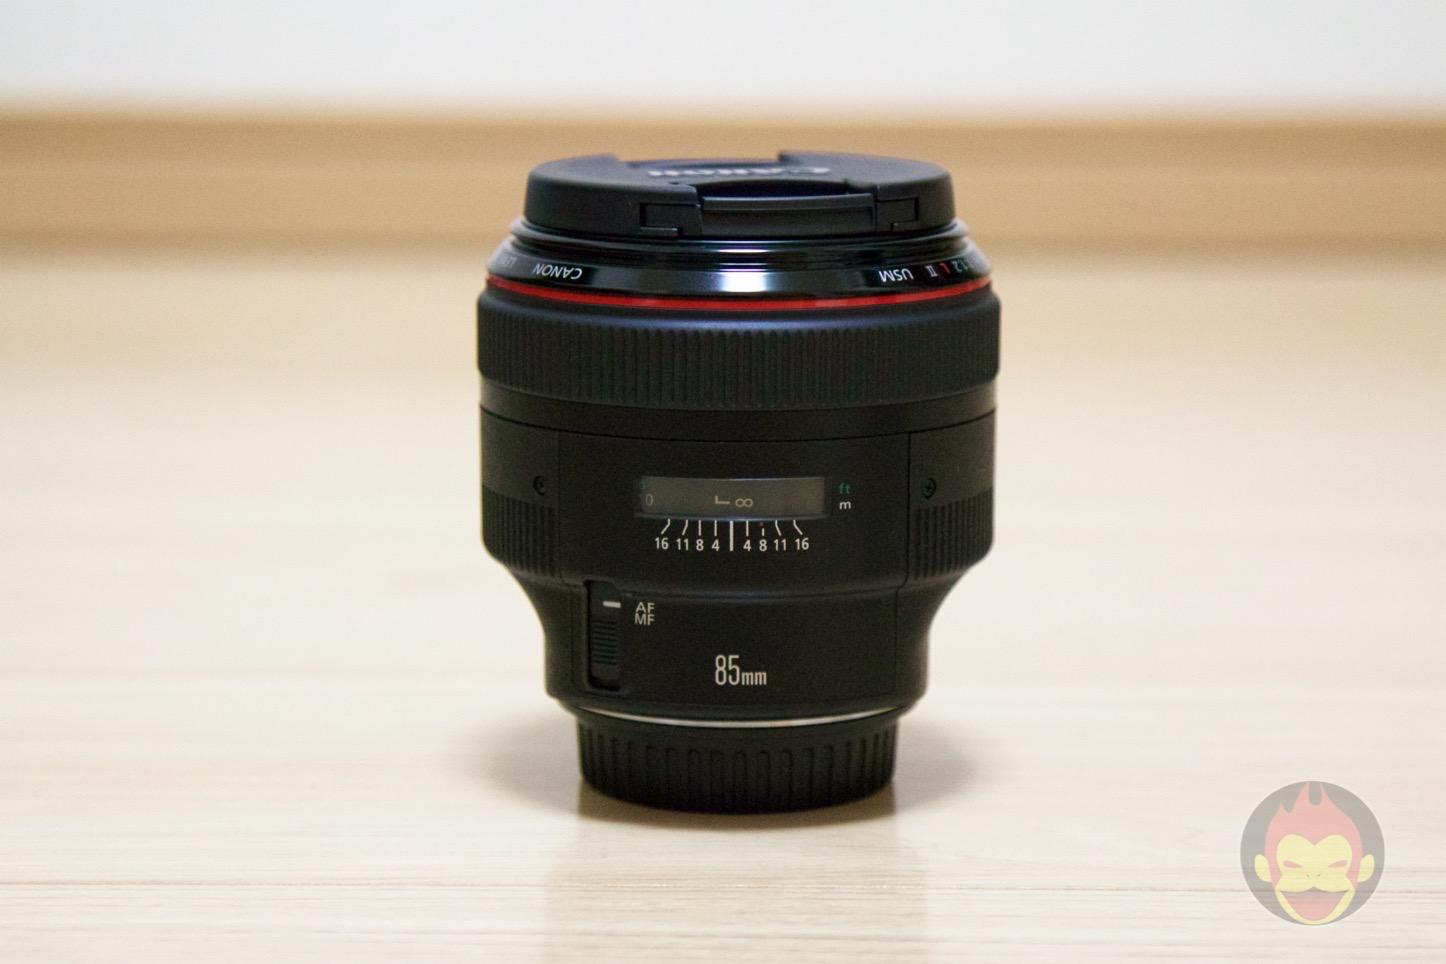 Canon Lens EF85mm F1.2 II USM